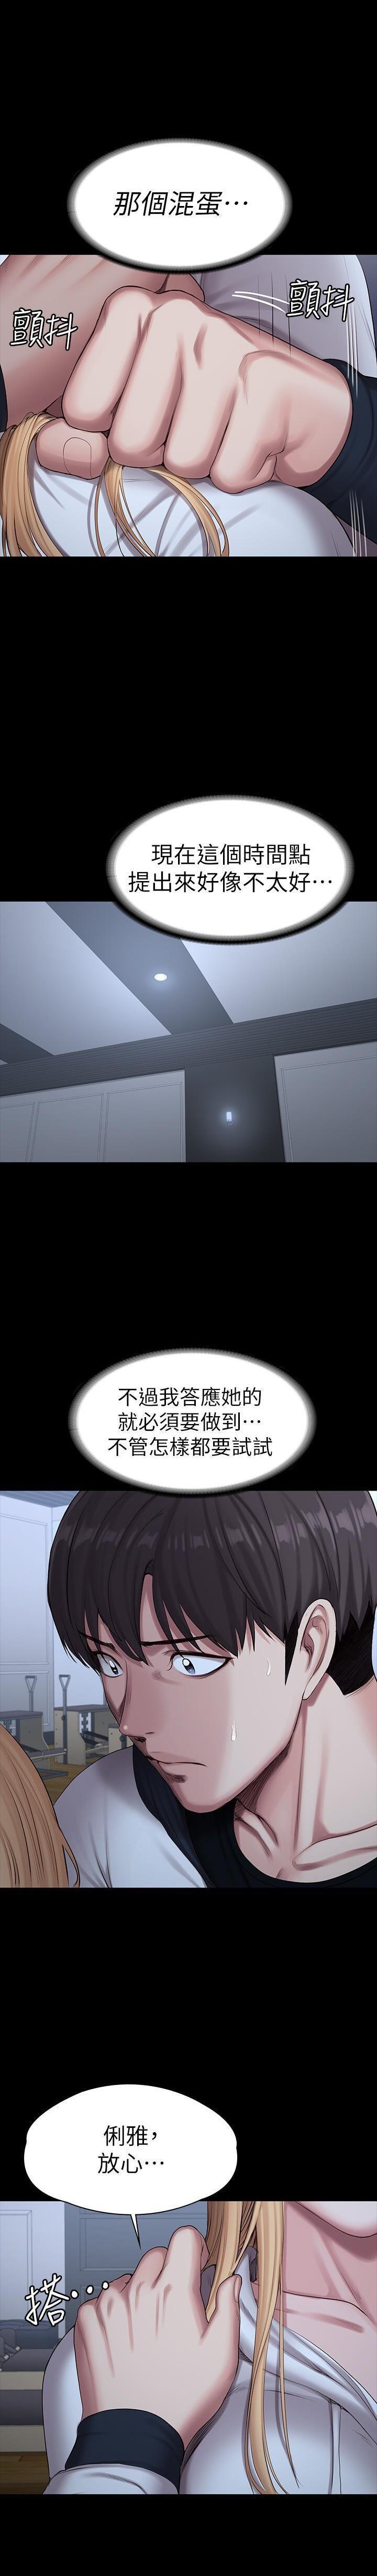 FITNESS 61-88 CHI 588